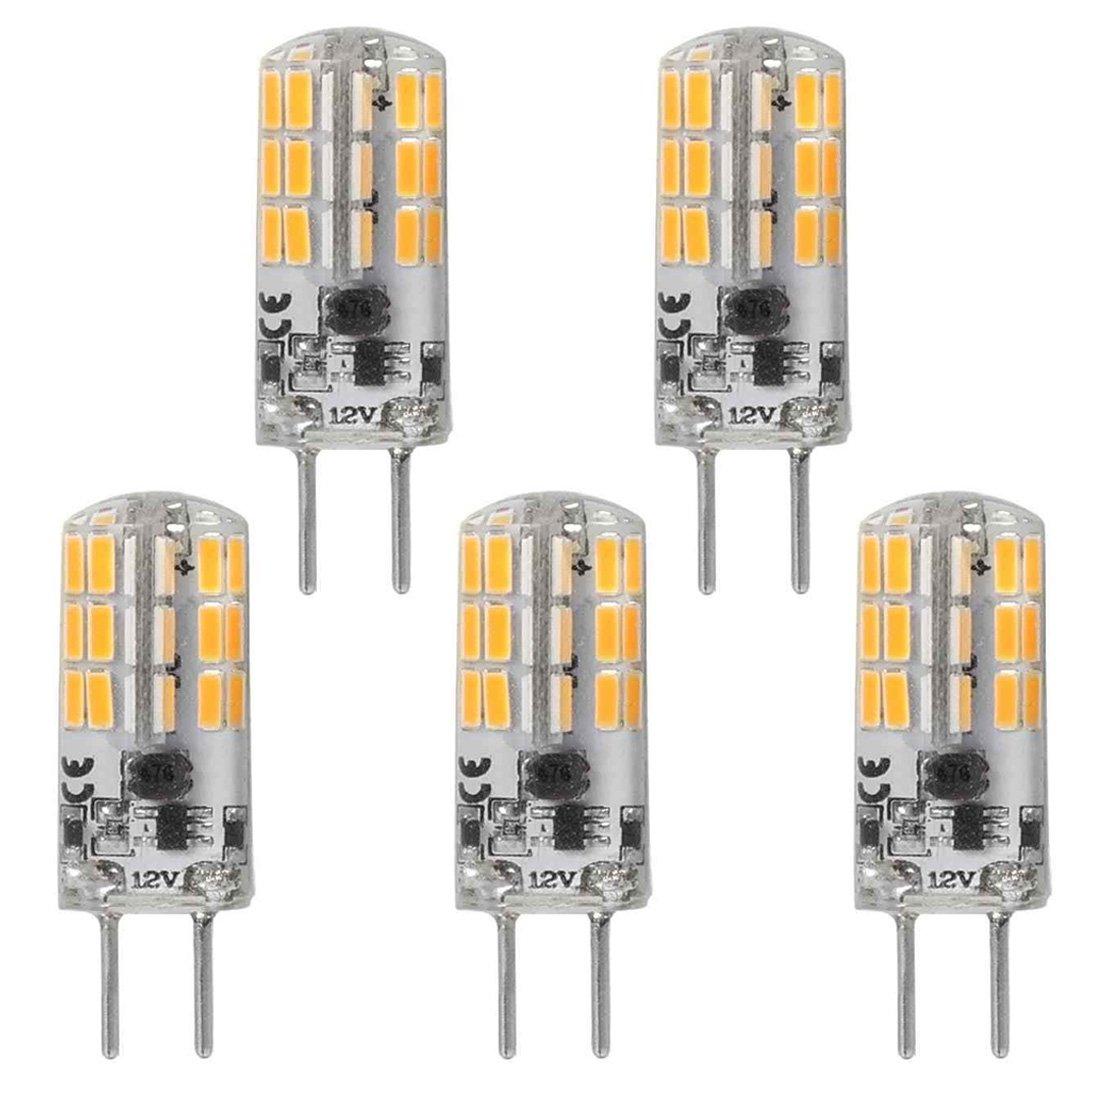 GY6.35 G6.35 Bi-pin Base LED Bulb 4Watt AC DC 12V Silica Gel Crystal Warm White 2700k-3000K Landscape Lighting,JC Type, Equivalent 25W- 30W Q35/CL/T4 Halogen Bulbs (5-Pack)